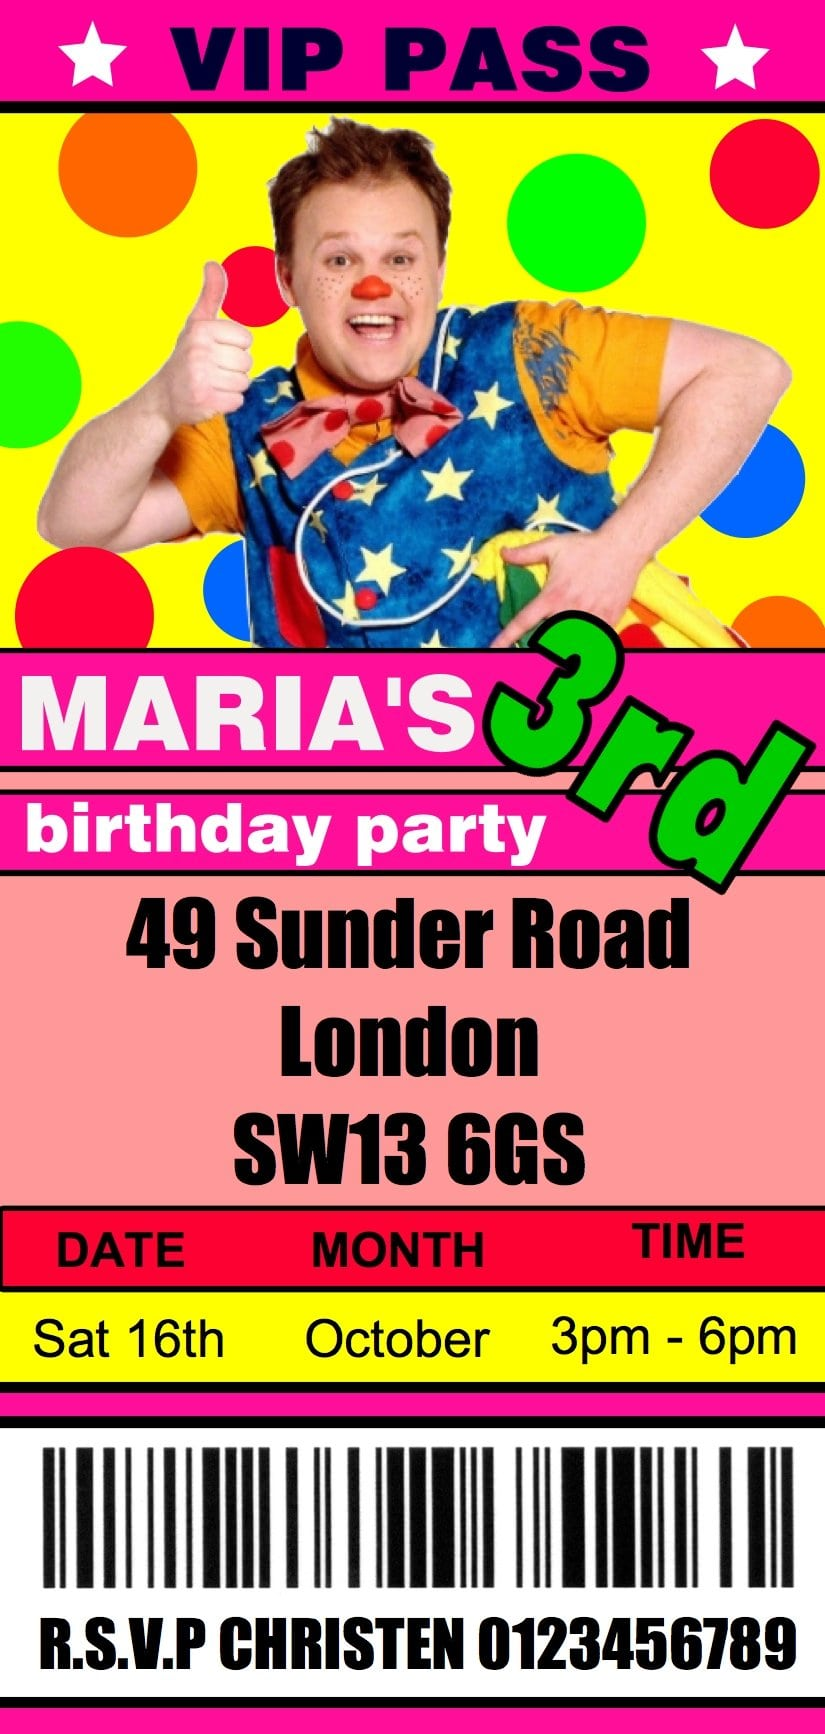 10 Personalised Mr Tumble Birthday Party Invitations Ticket   Vip